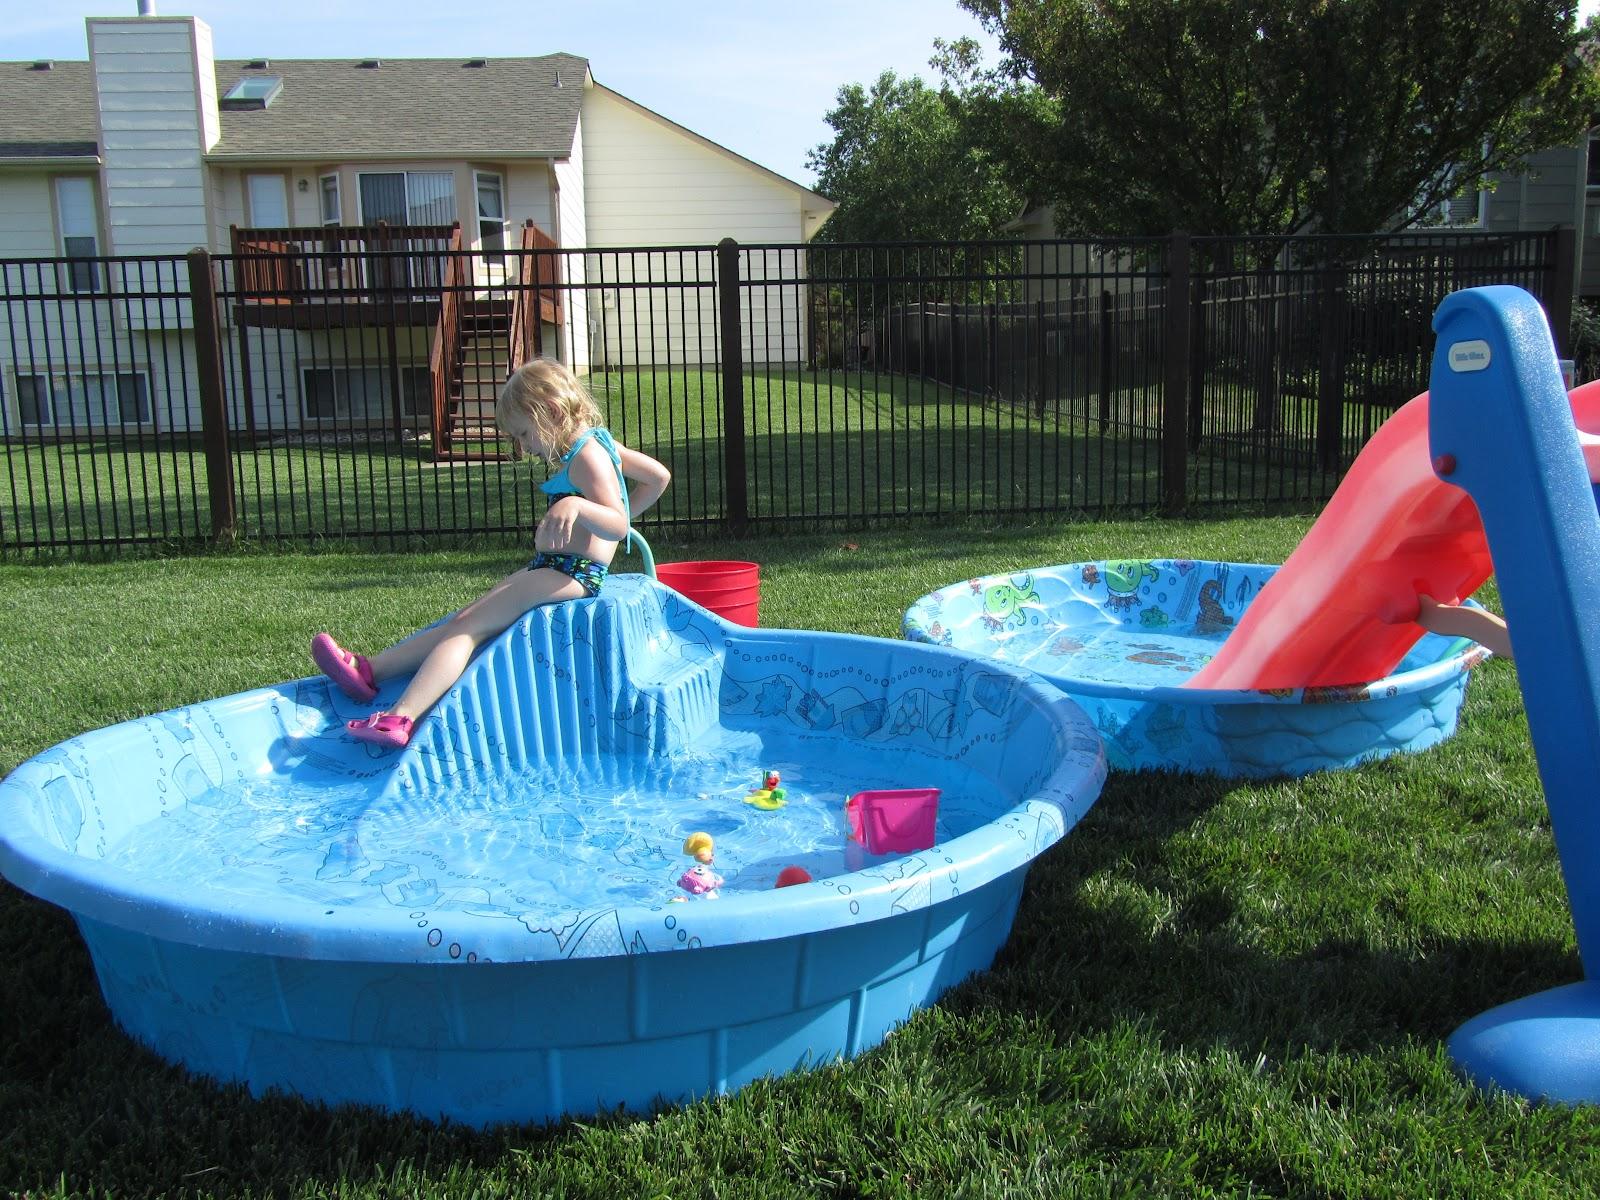 [pics of backyard pools]